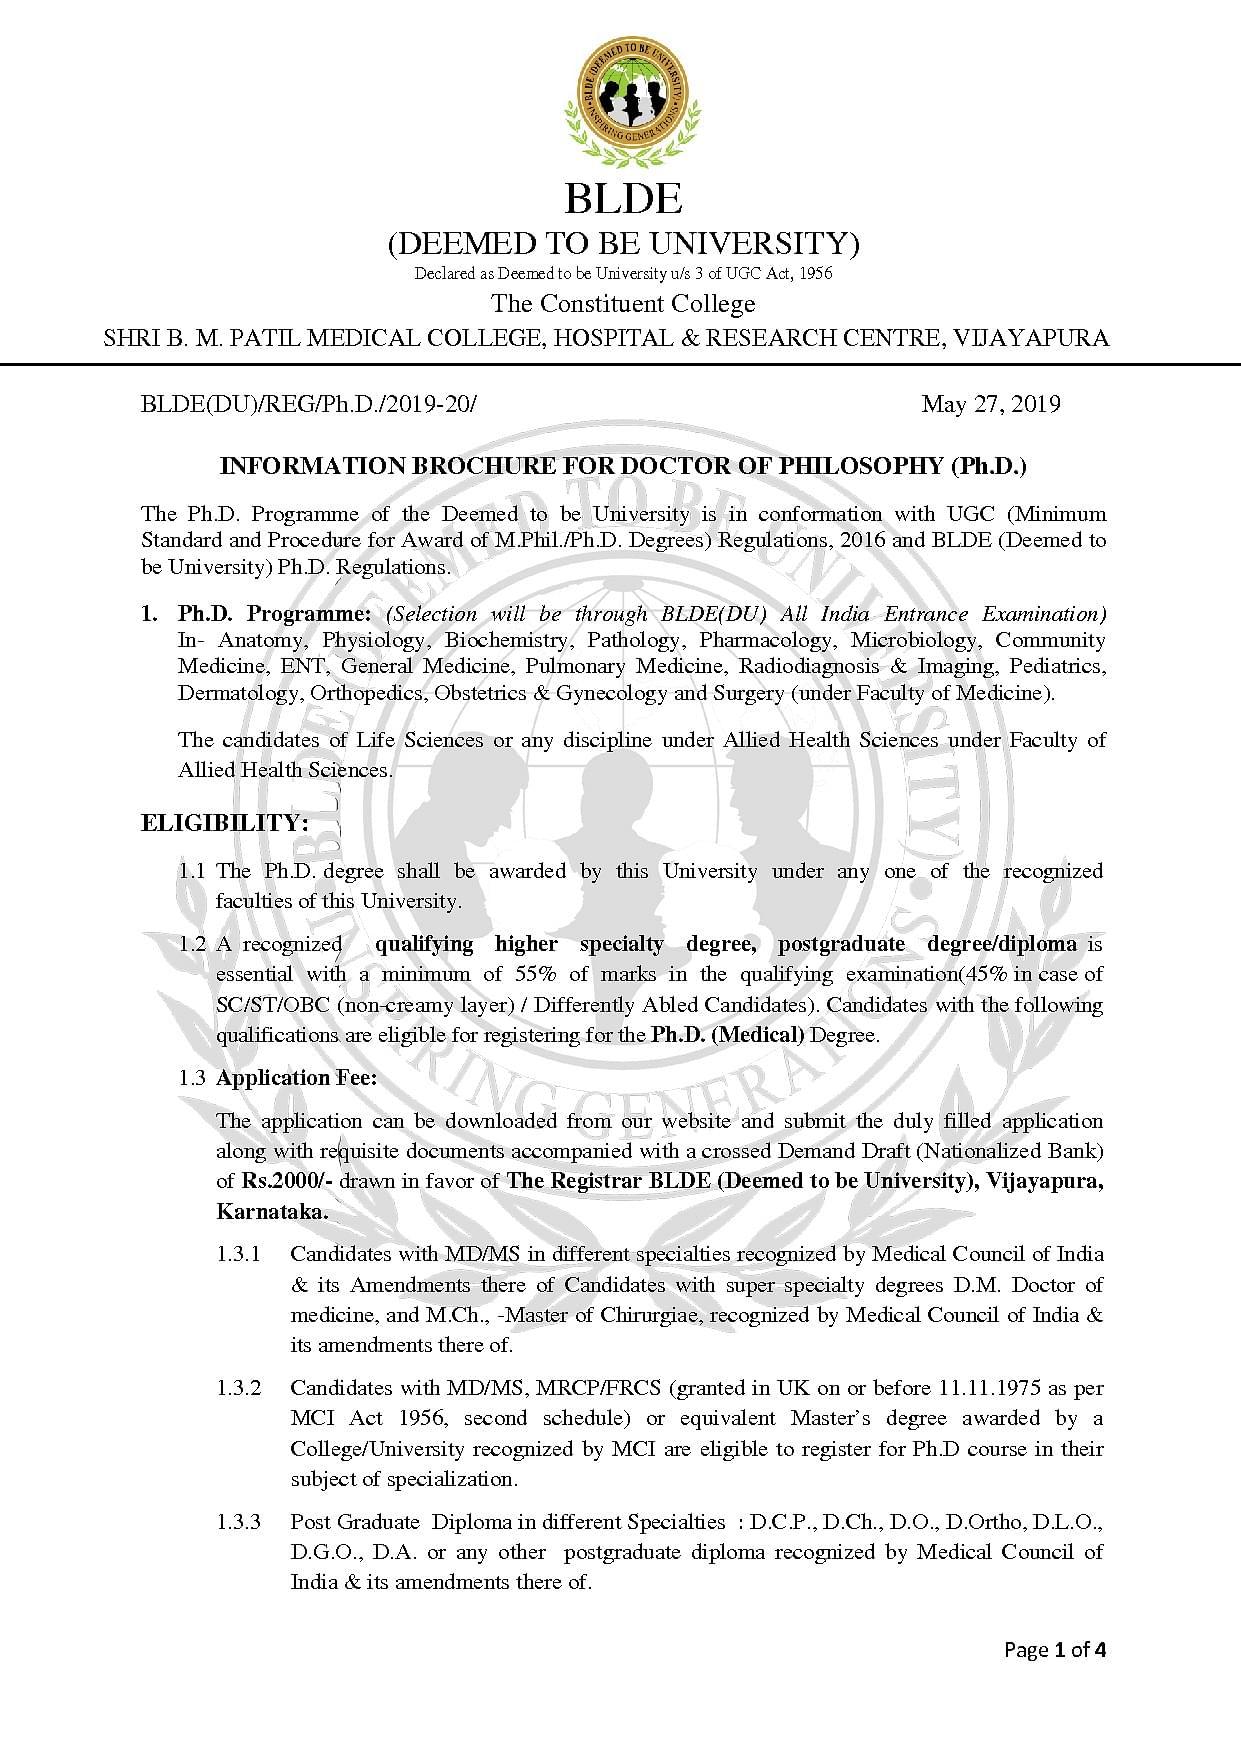 BLDE University, Bijapur - Admissions, Contact, Website